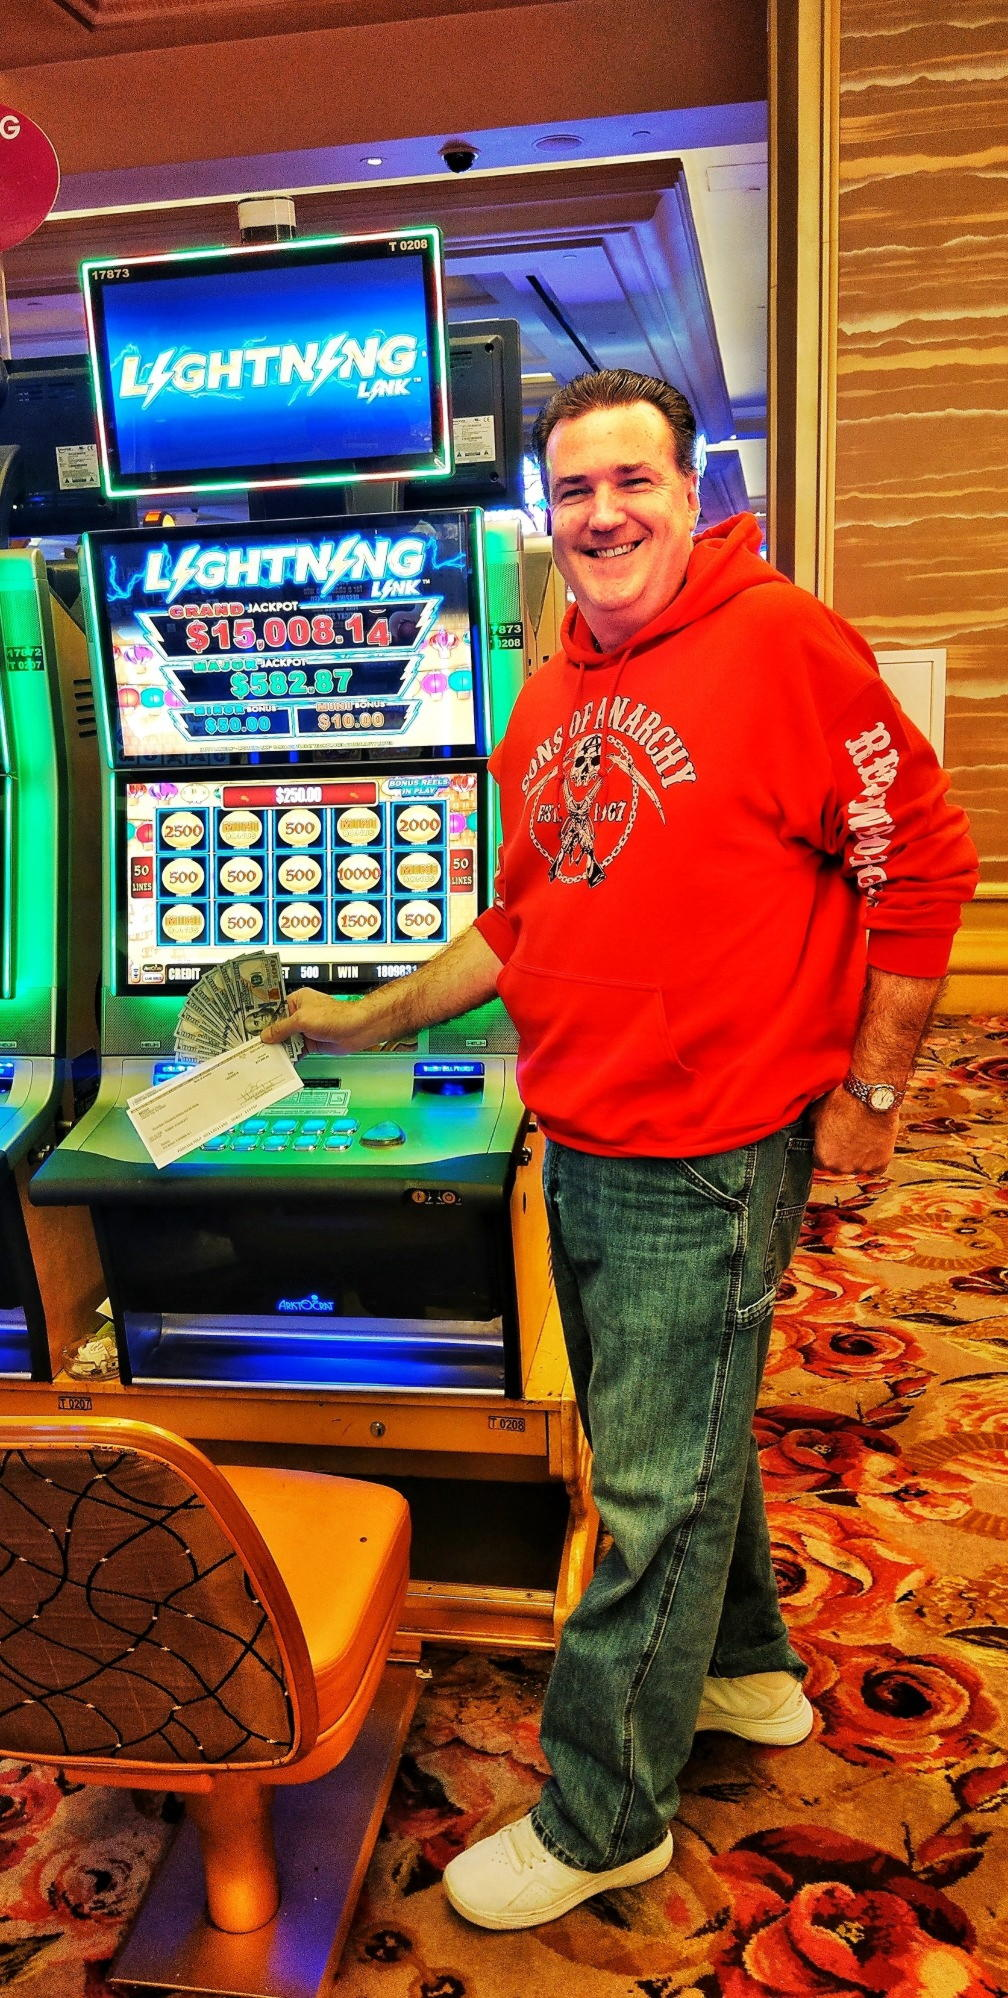 275% Match bonus at Party Casino